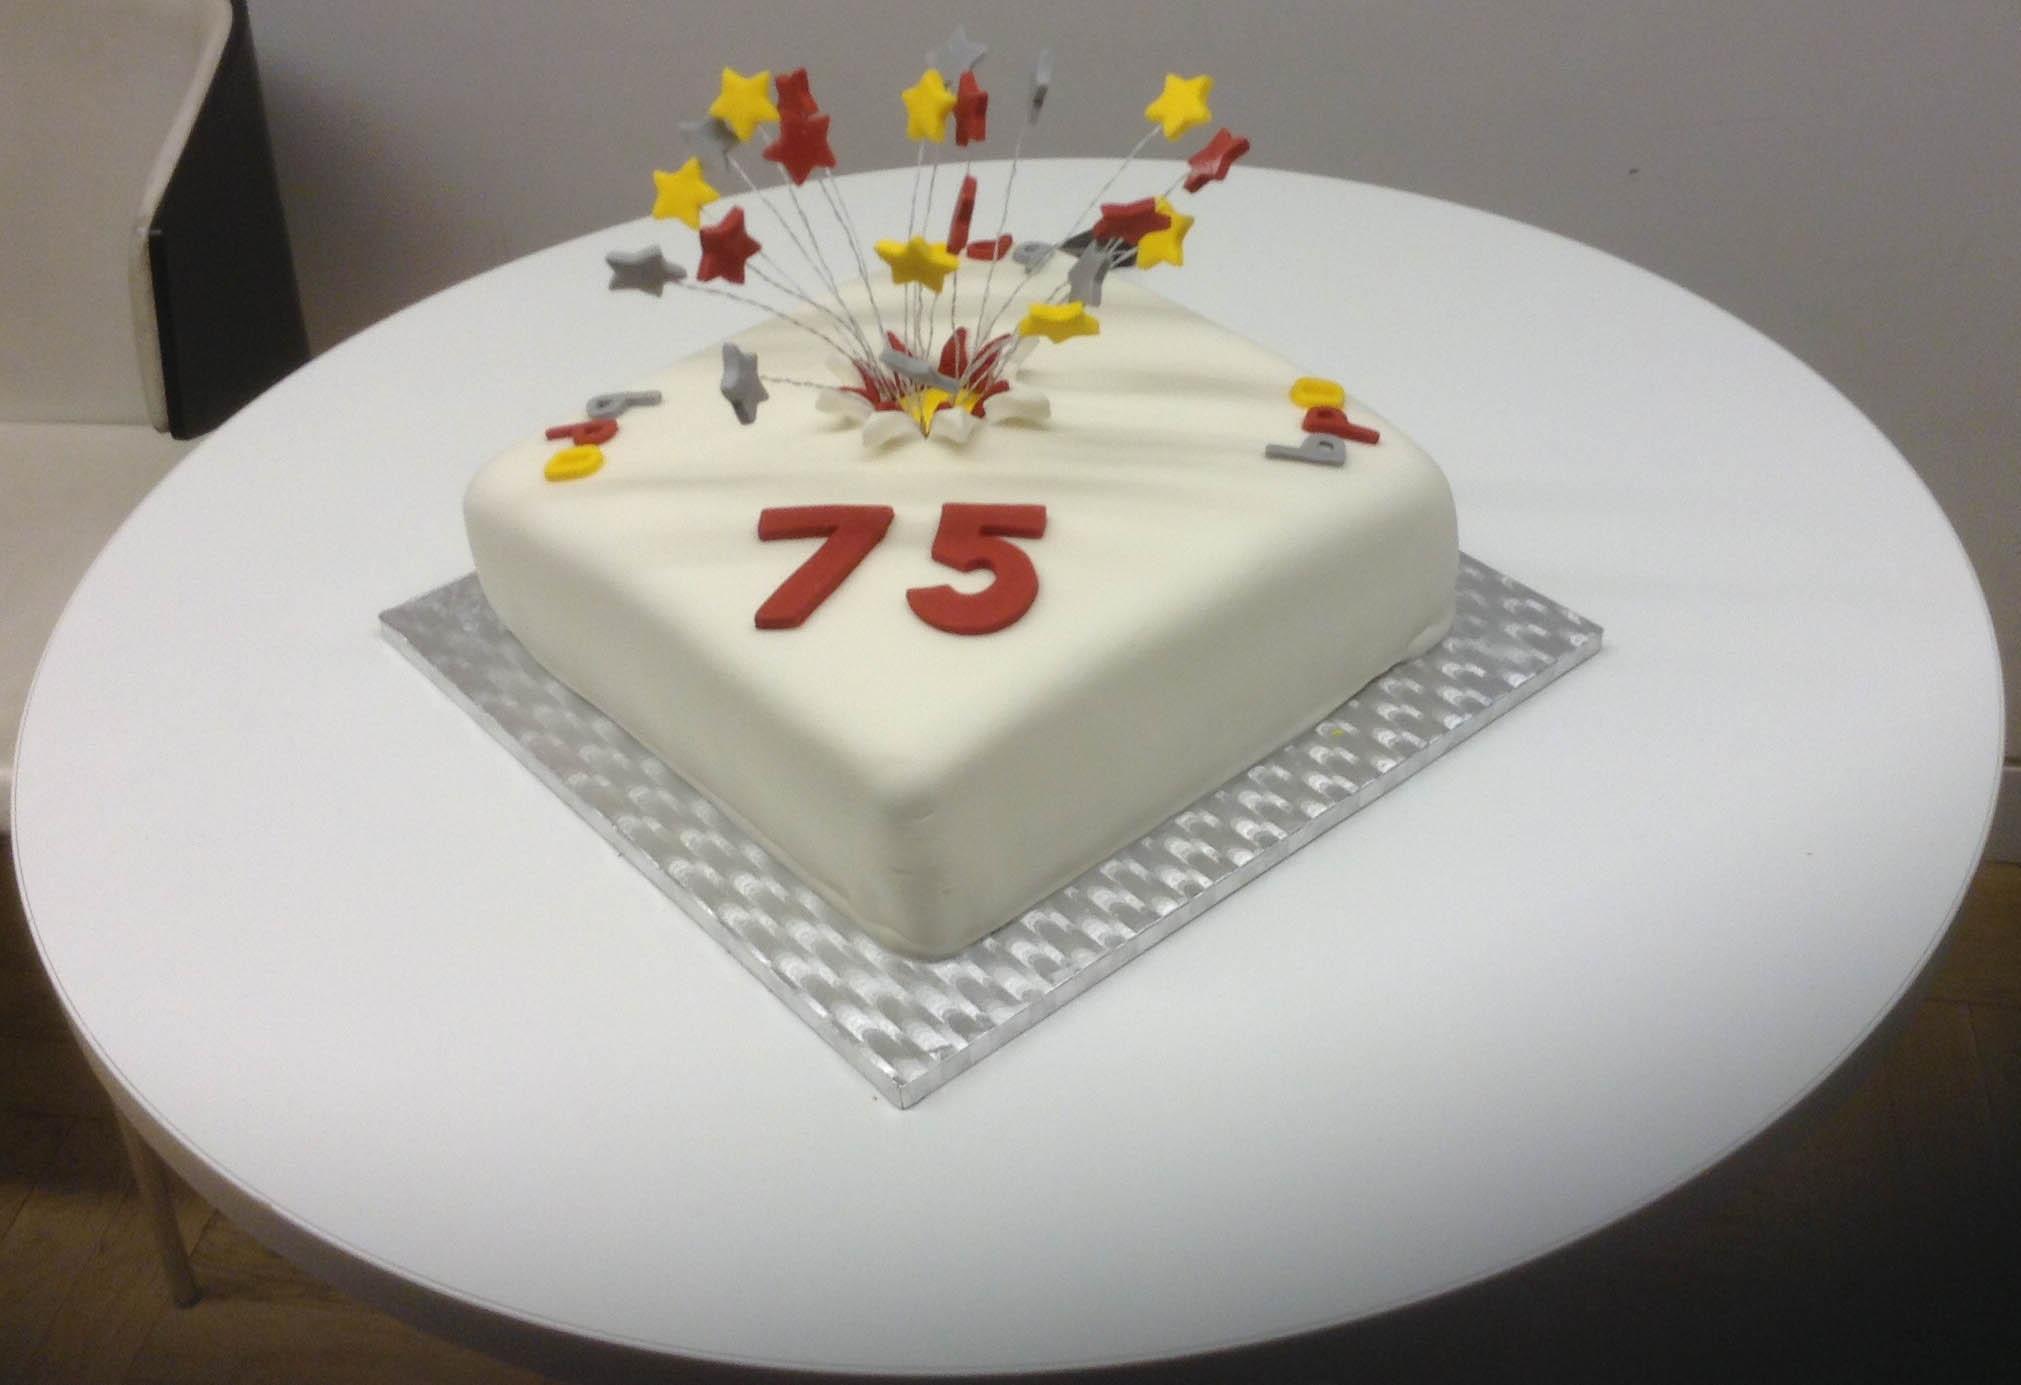 75th Birthday Cakes  Our 75th Birthday Cake – BPO